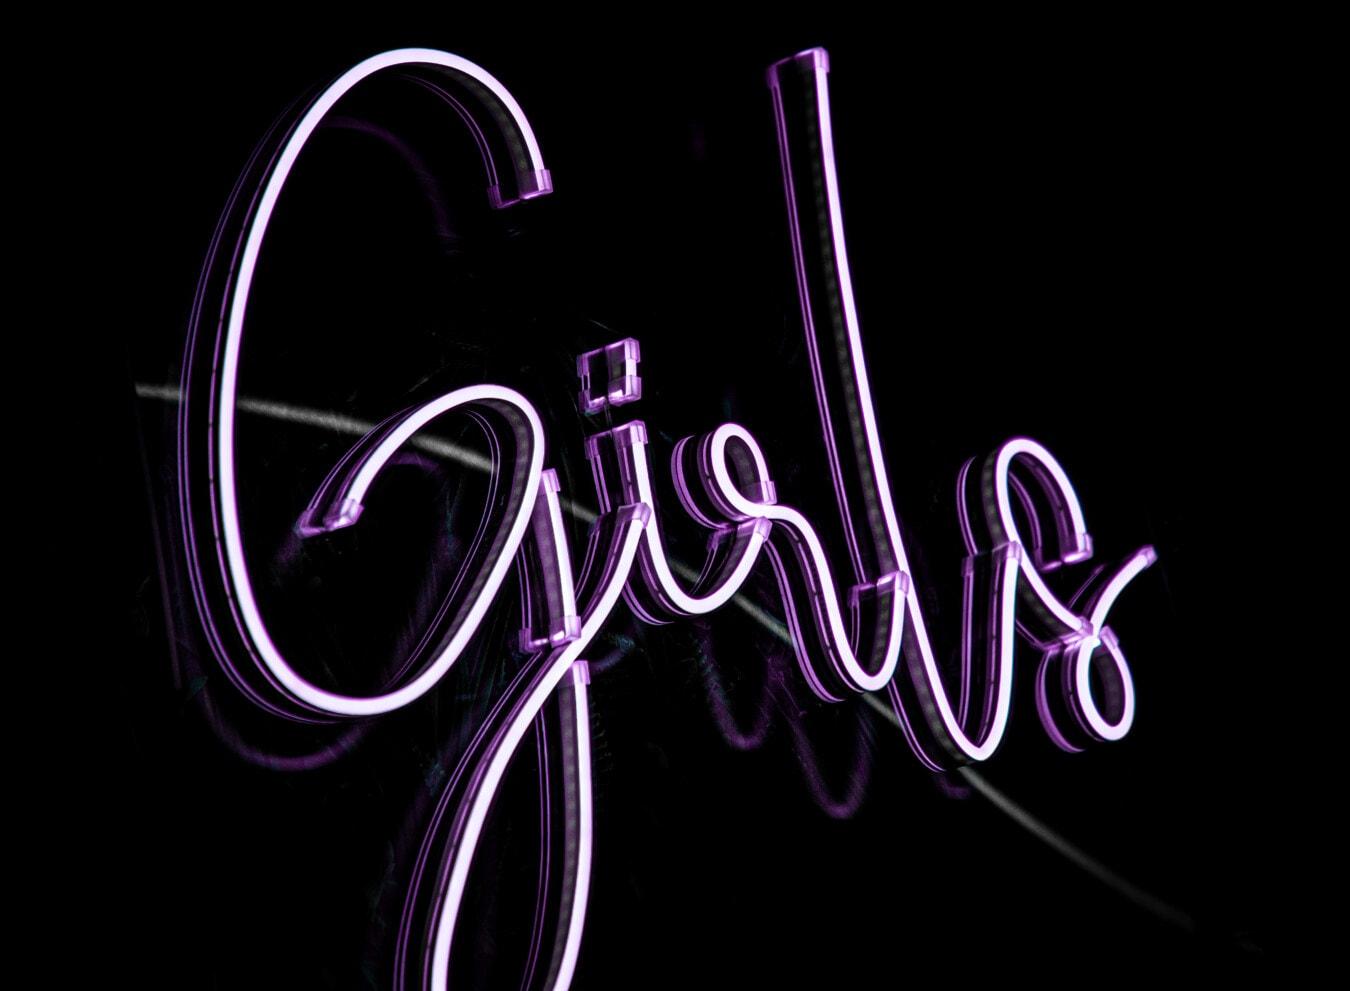 neon, sign, purplish, text, girls, typography, violet, black, symbol, creative